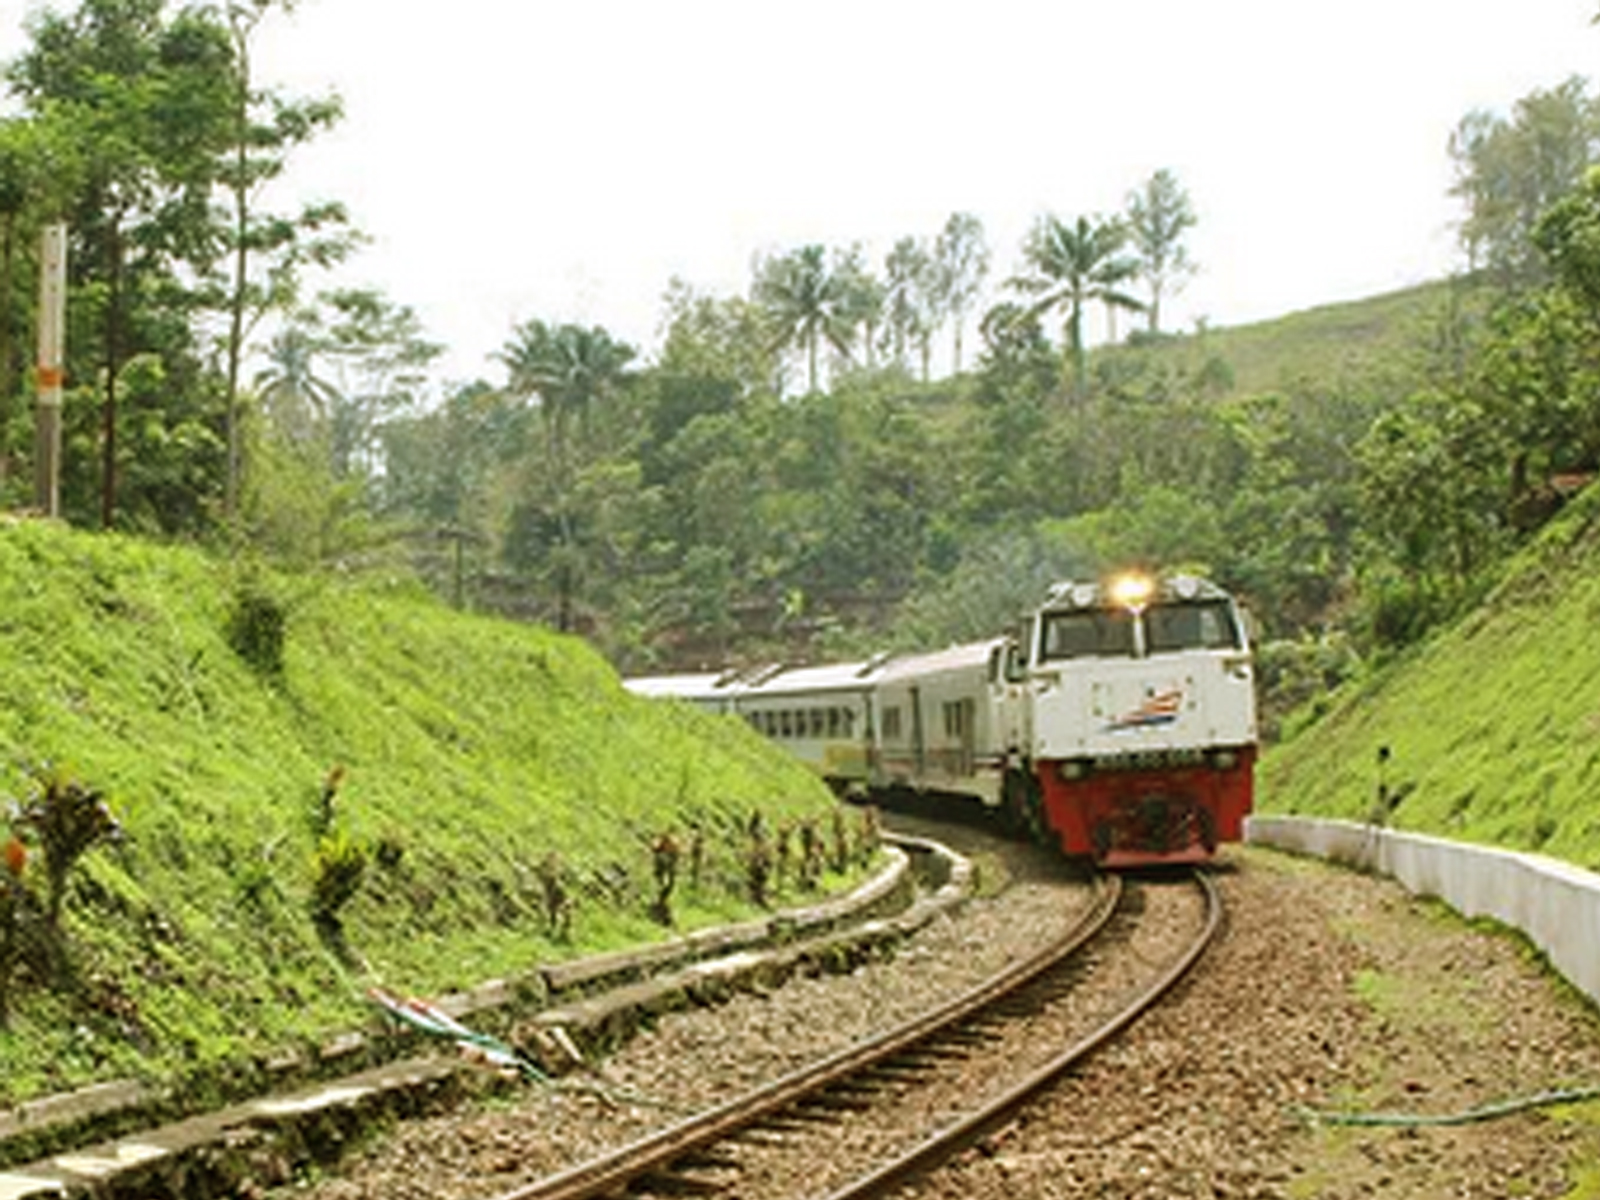 Kereta api Ciremai Bandung - Cirebon - Semarang